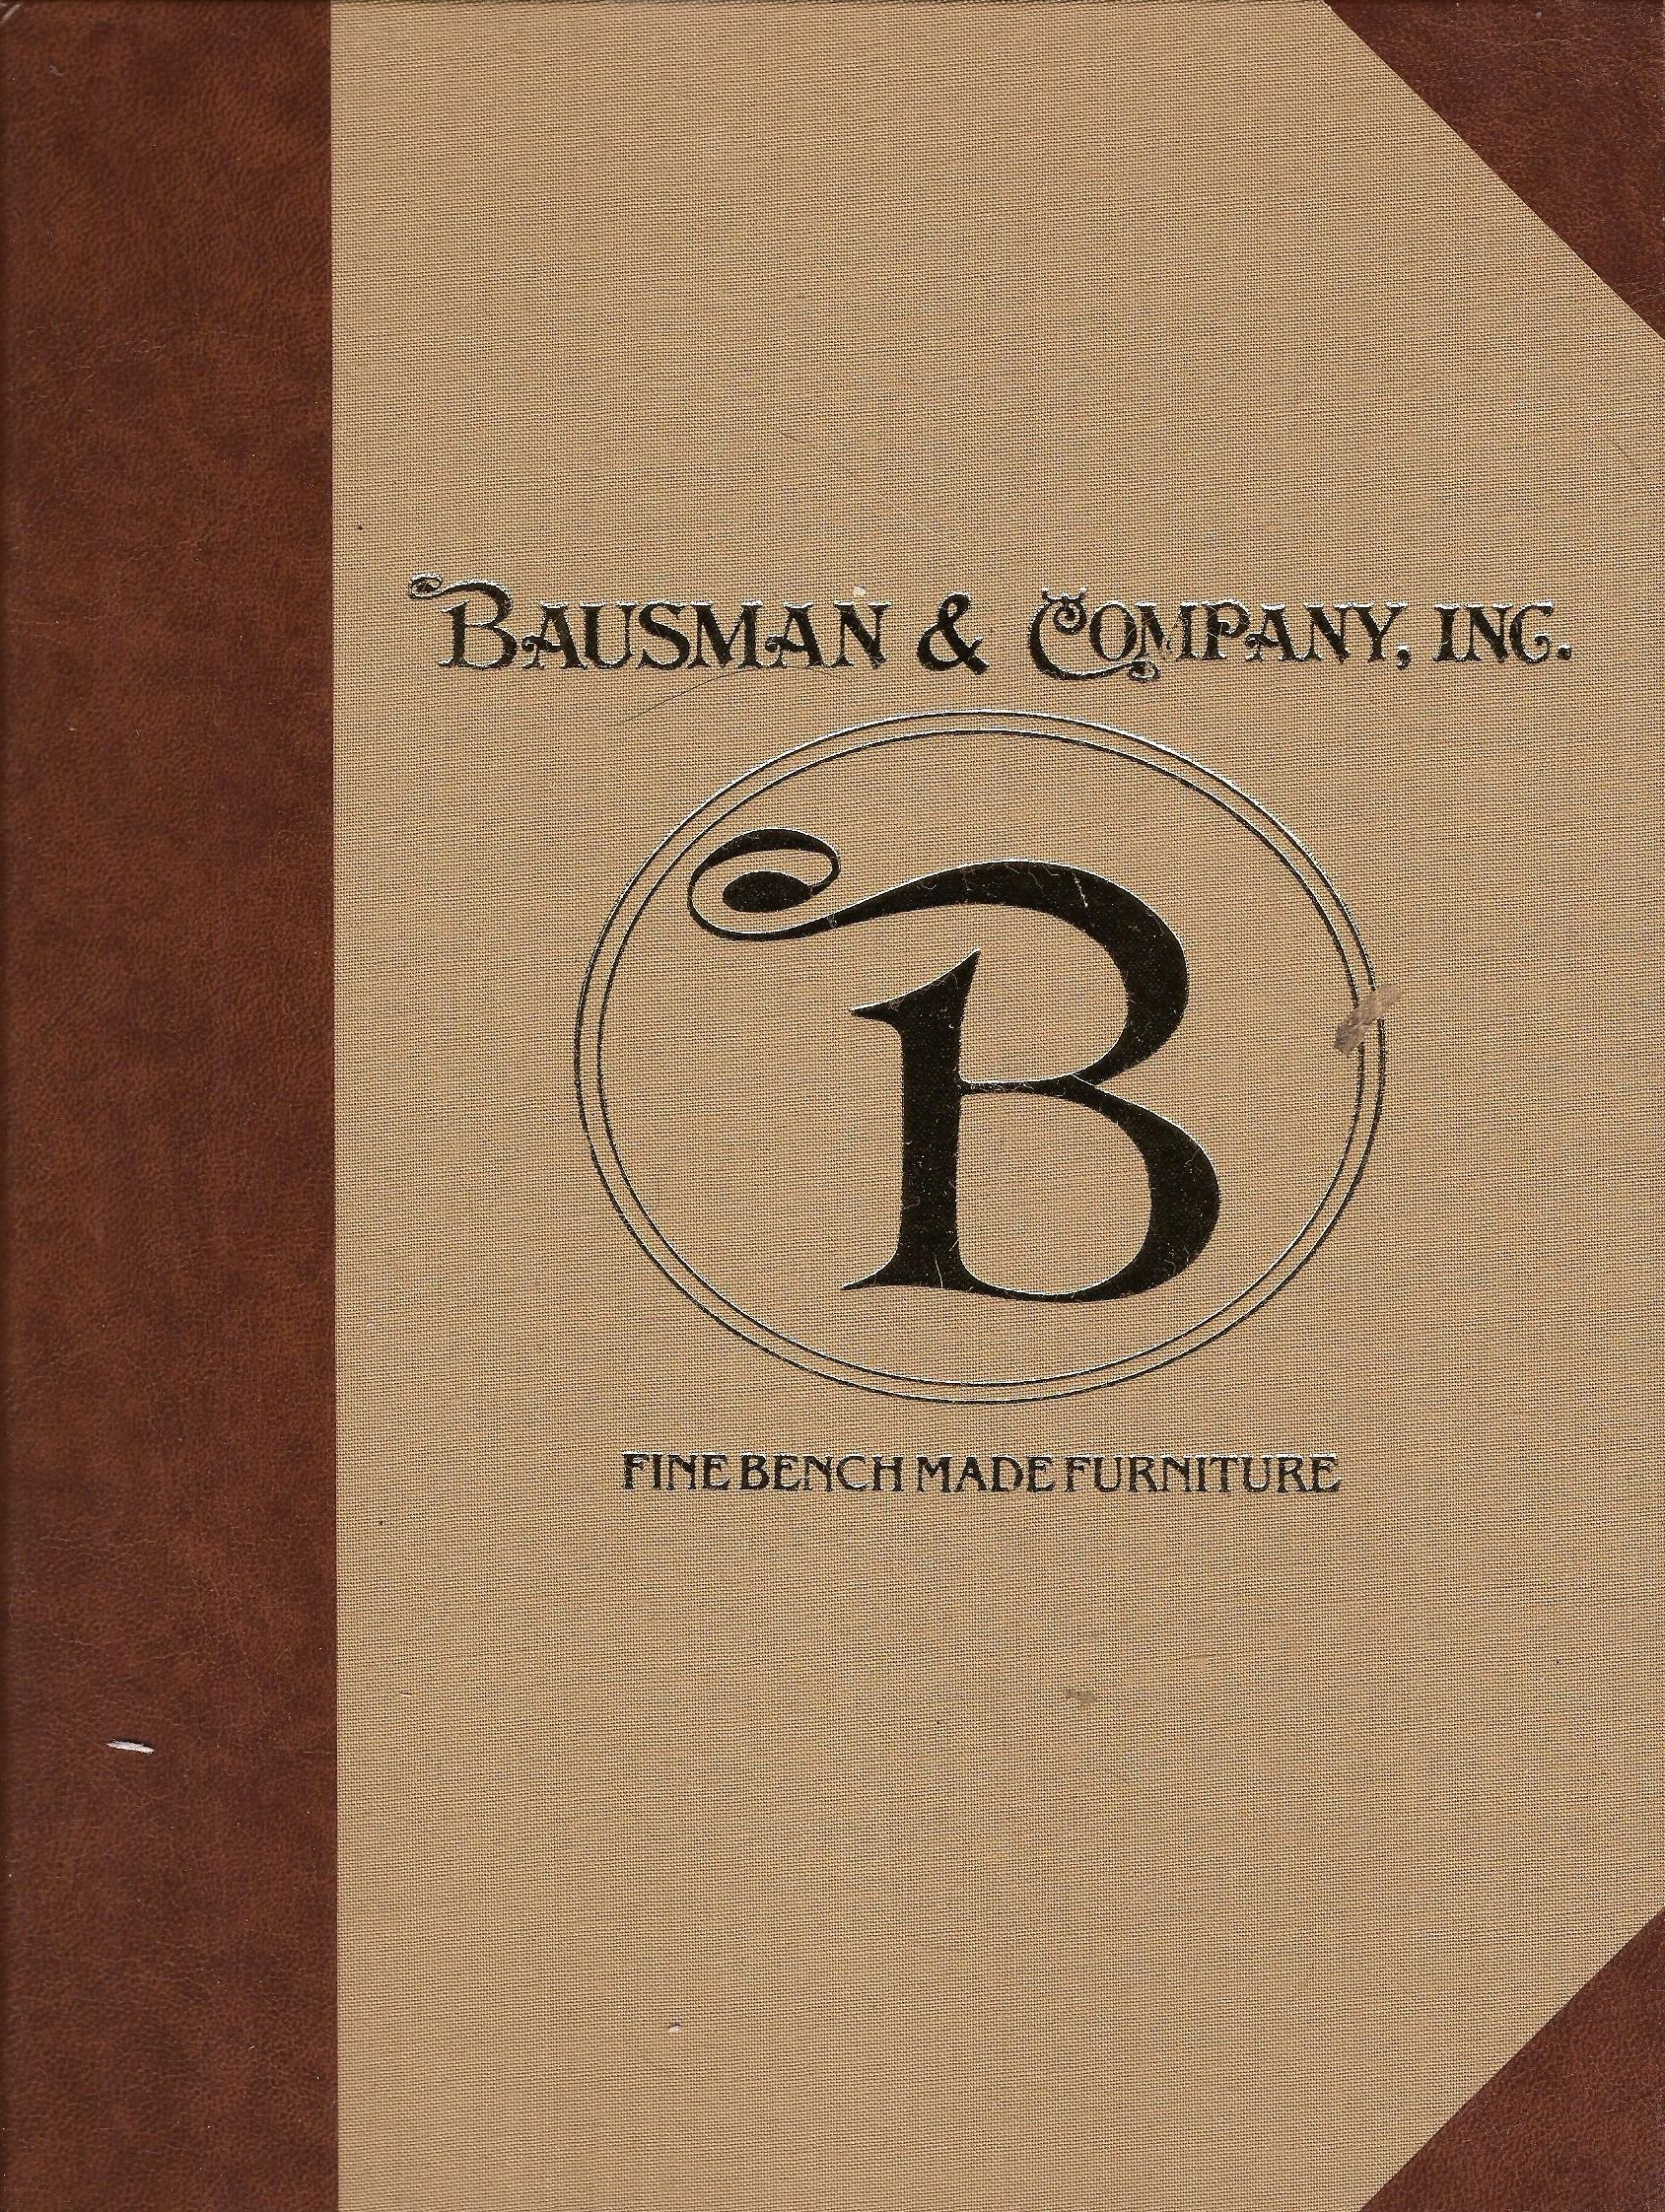 BAUSMAN logo